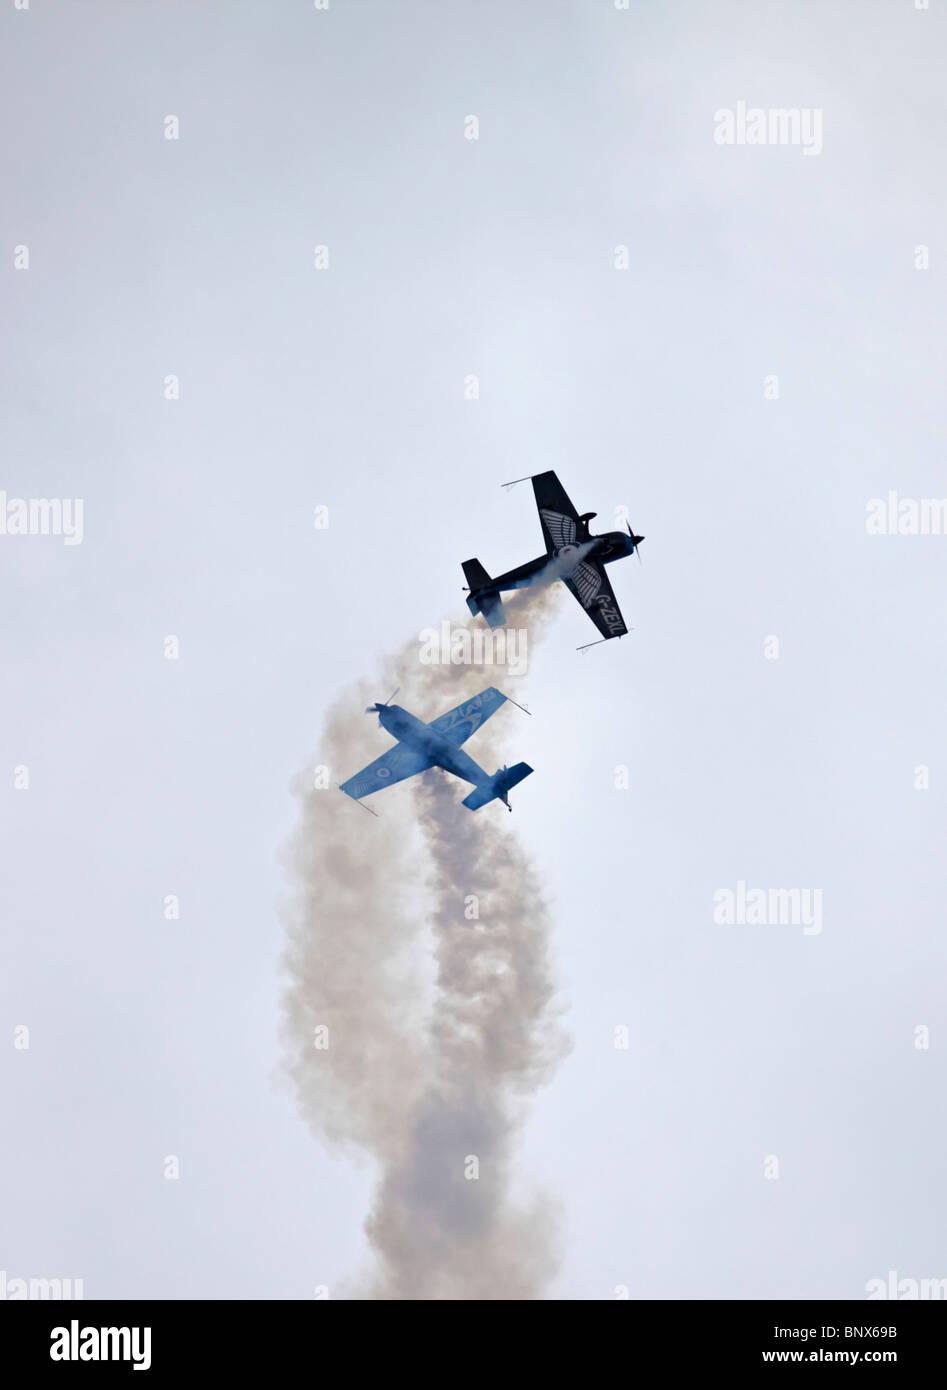 Farnborough The Blades Extra 300 LPS aerobatic display aircraft - Stock Image